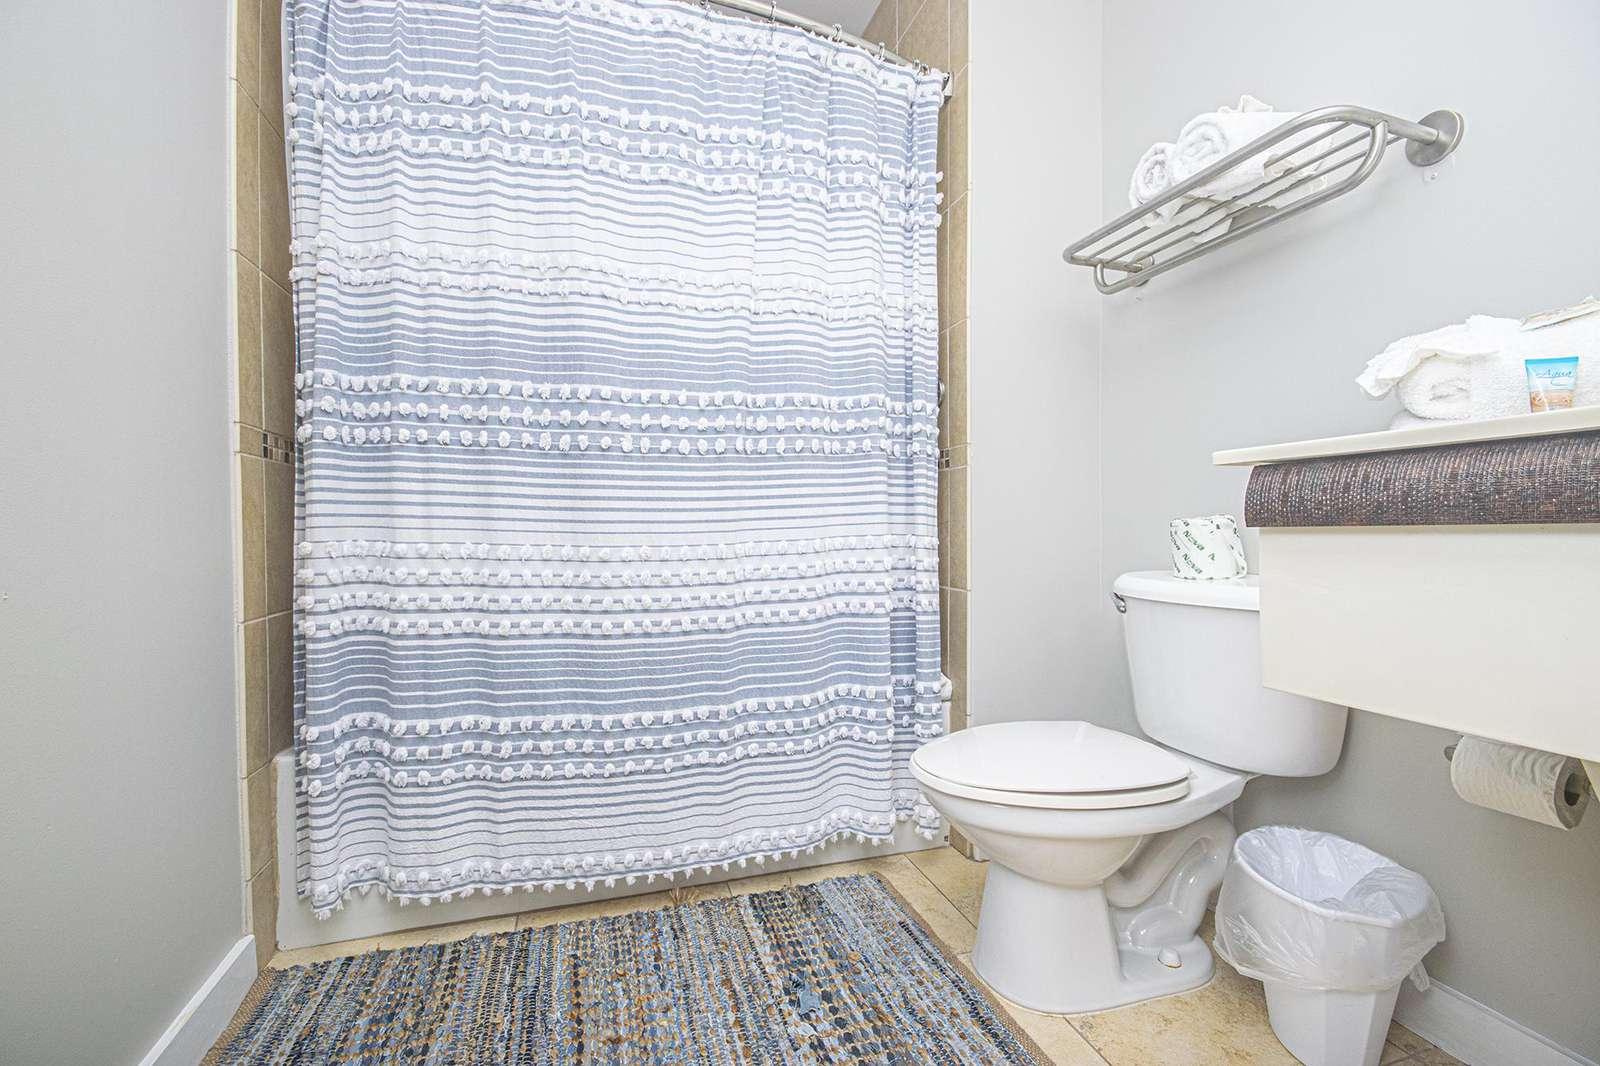 Full size bath stocked with basic linen!